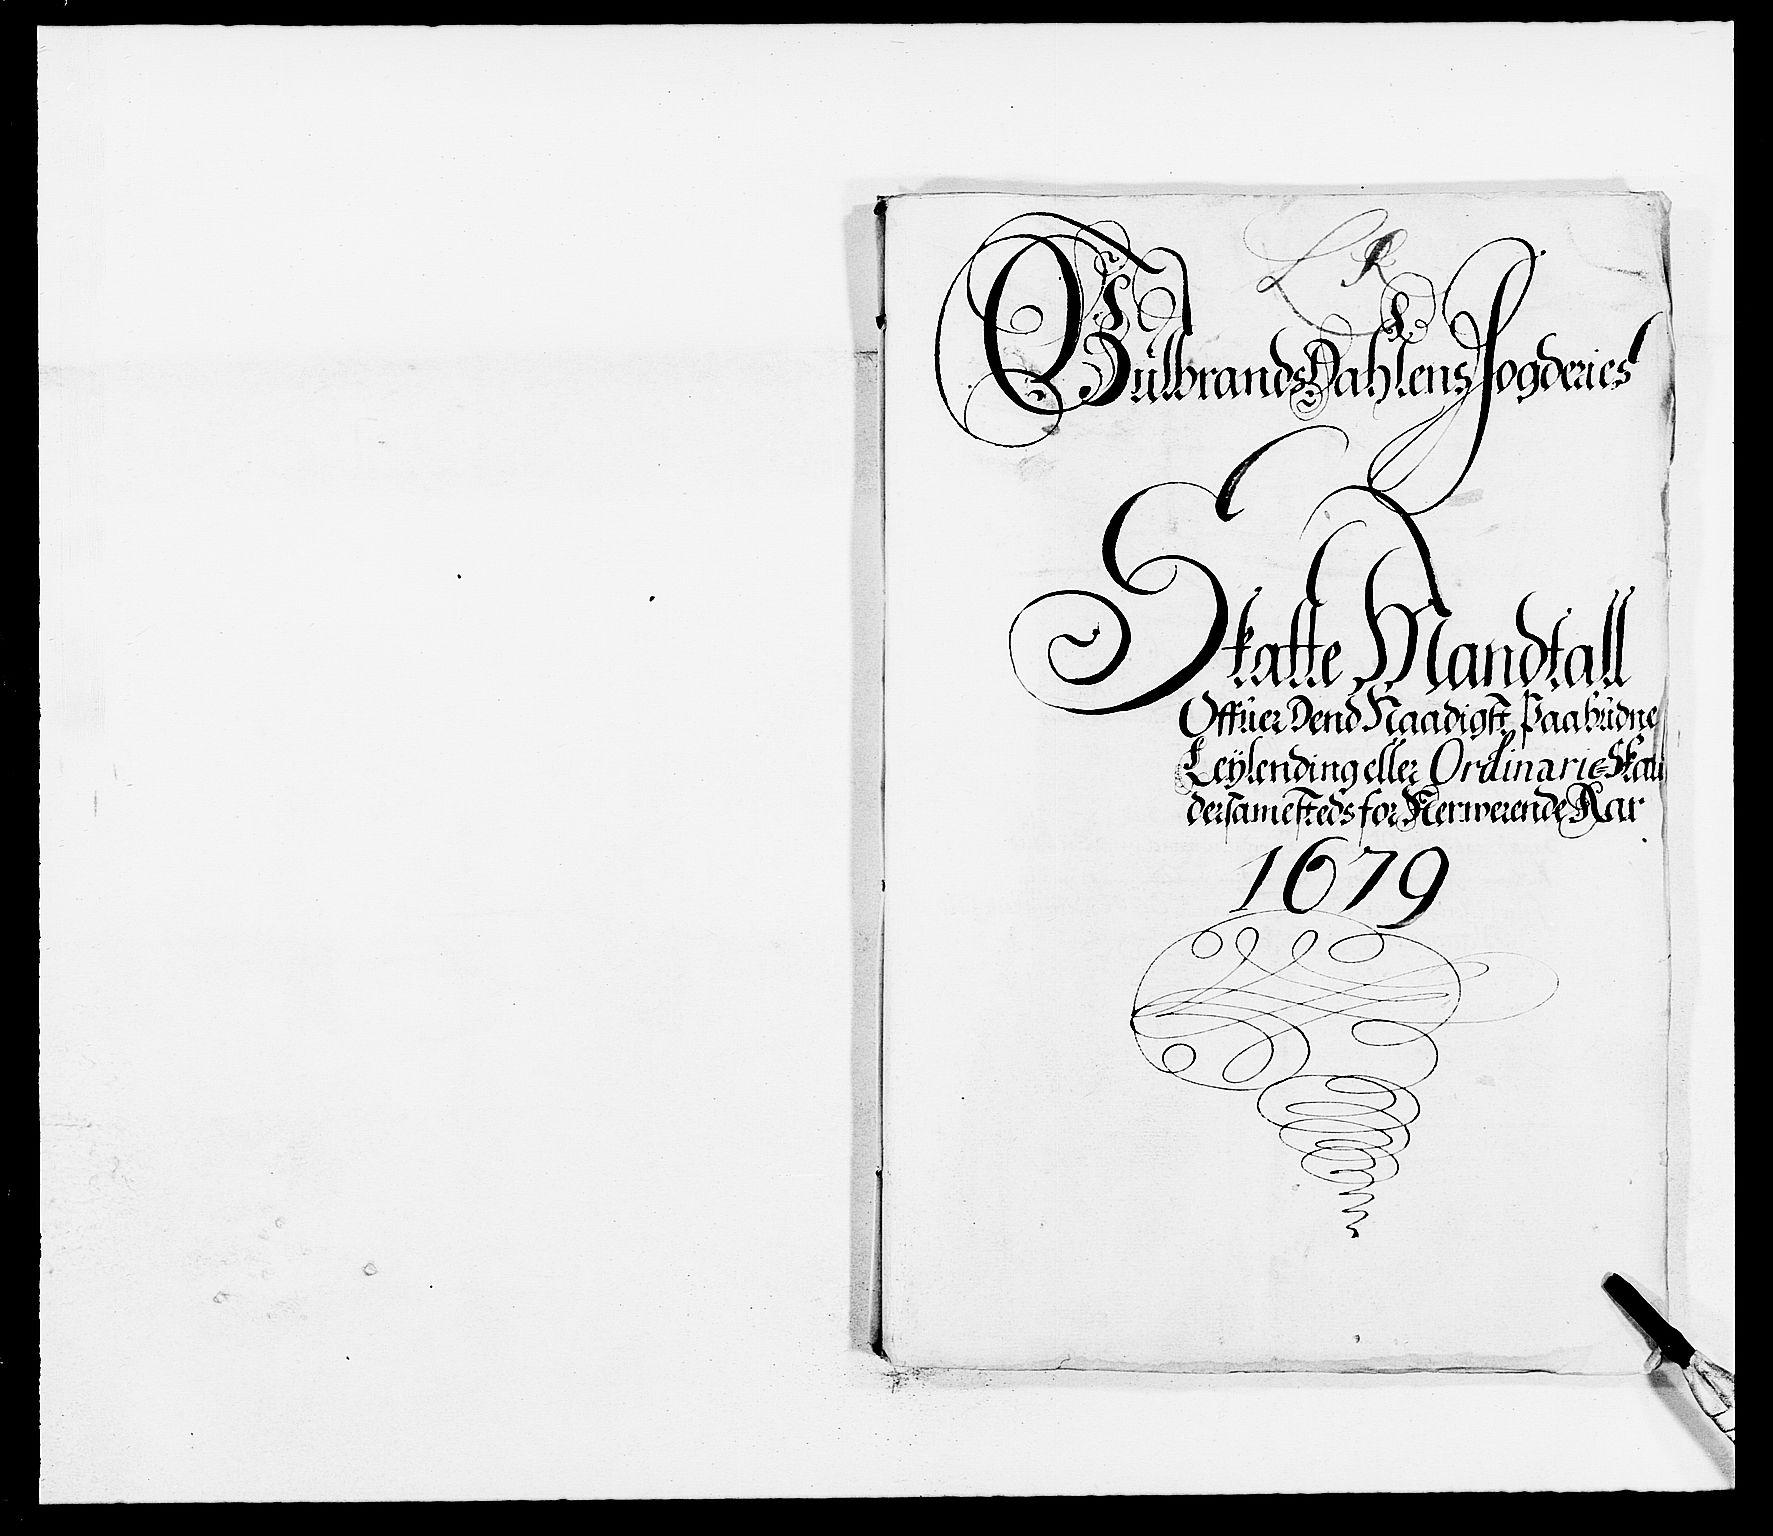 RA, Rentekammeret inntil 1814, Reviderte regnskaper, Fogderegnskap, R17/L1153: Fogderegnskap Gudbrandsdal, 1678-1679, s. 198